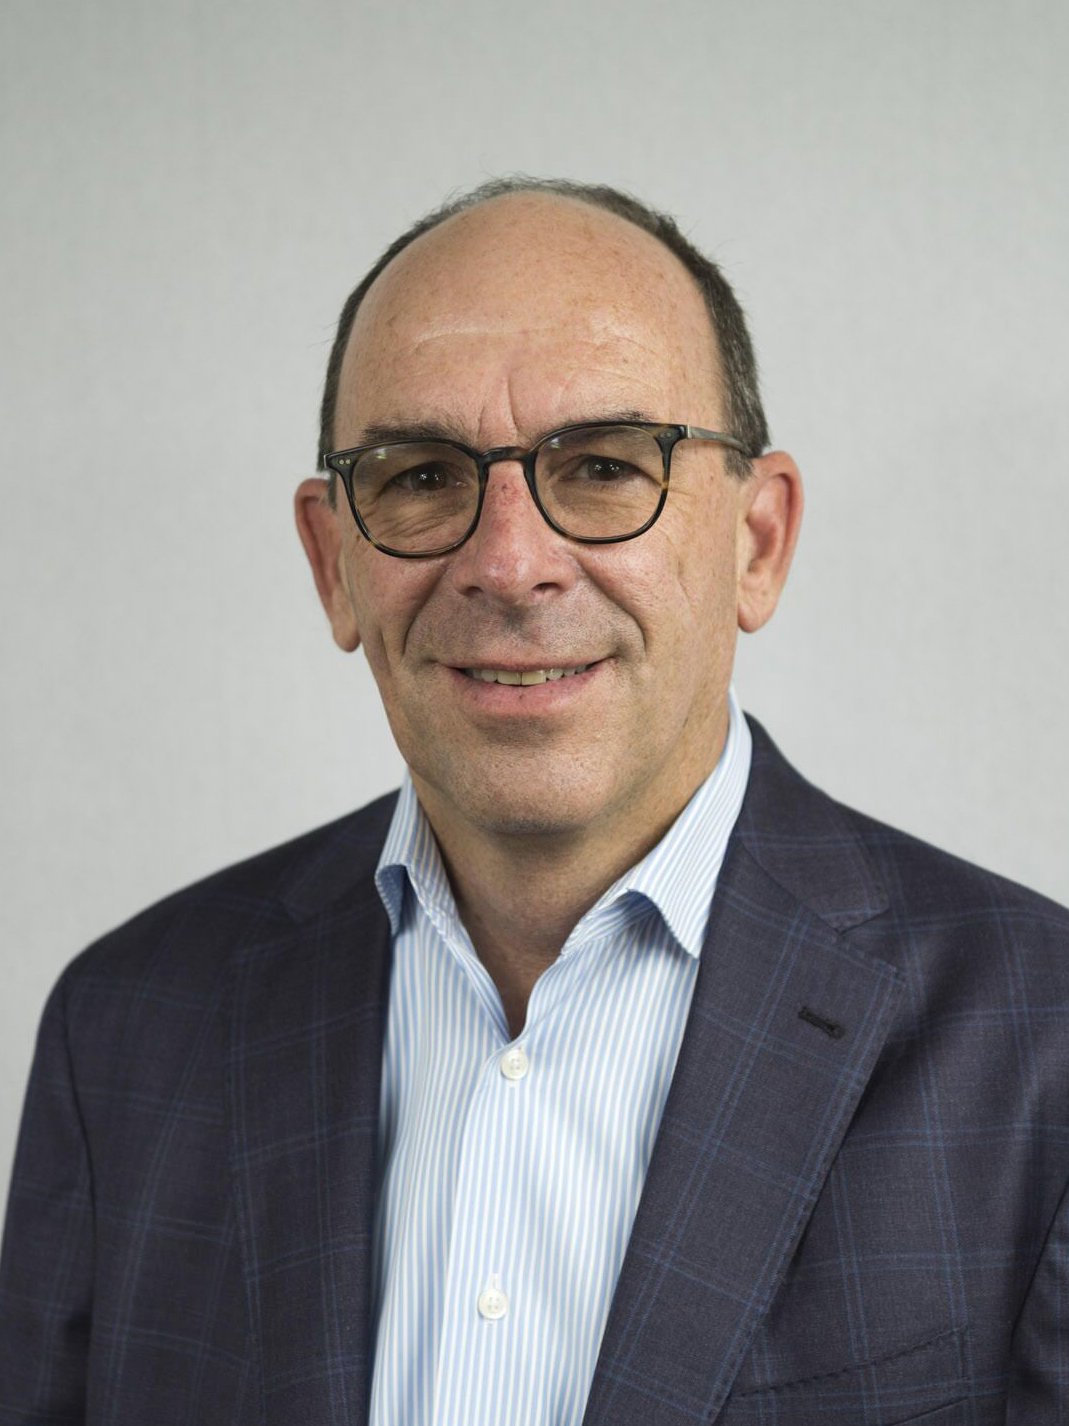 Paul Arpin